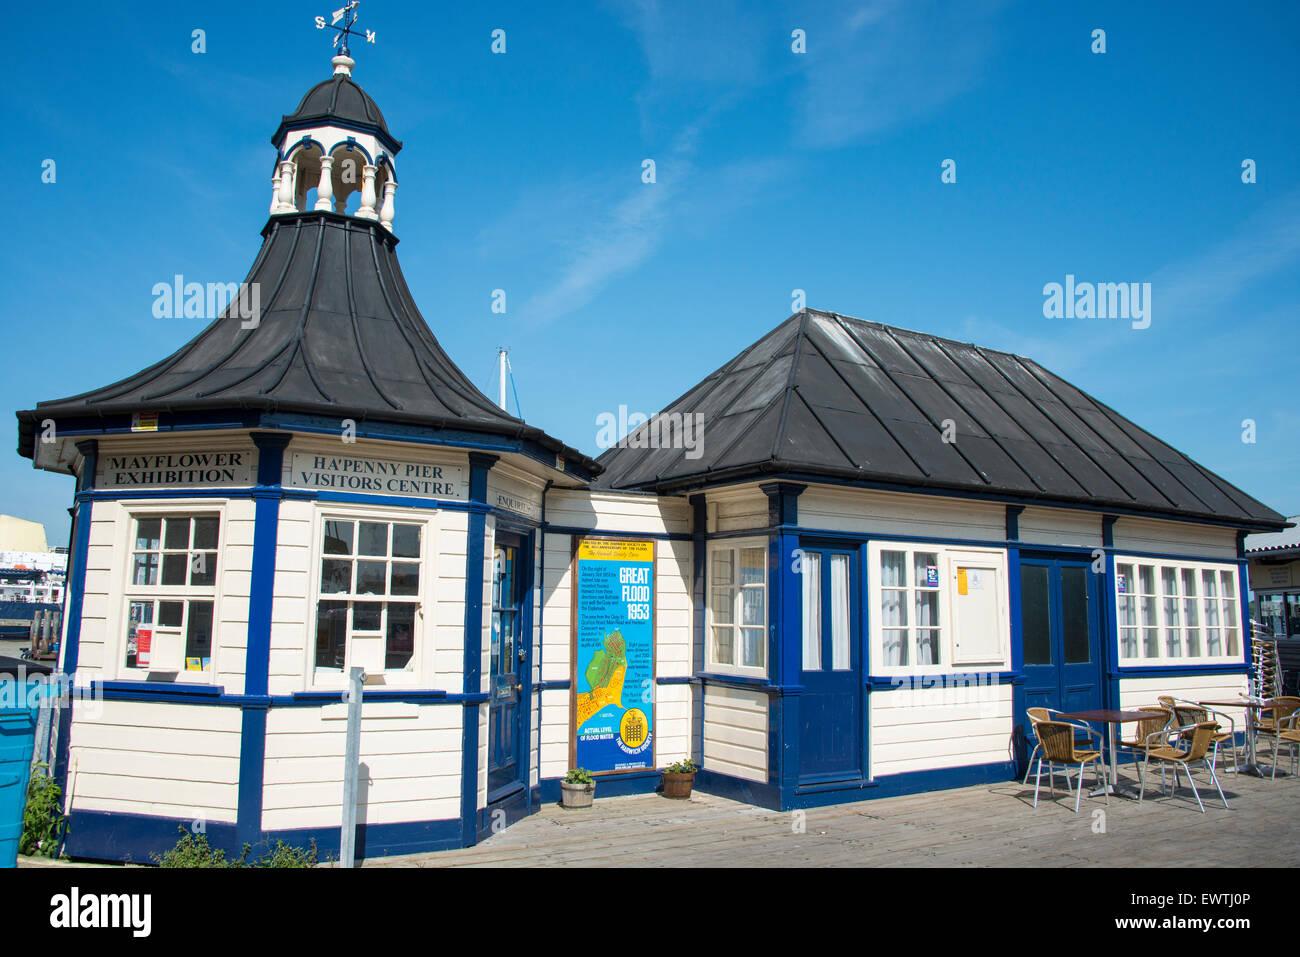 Ha'Penny Pier Visitors Centre, The Quay, Harwich, Essex, England, United Kingdom - Stock Image